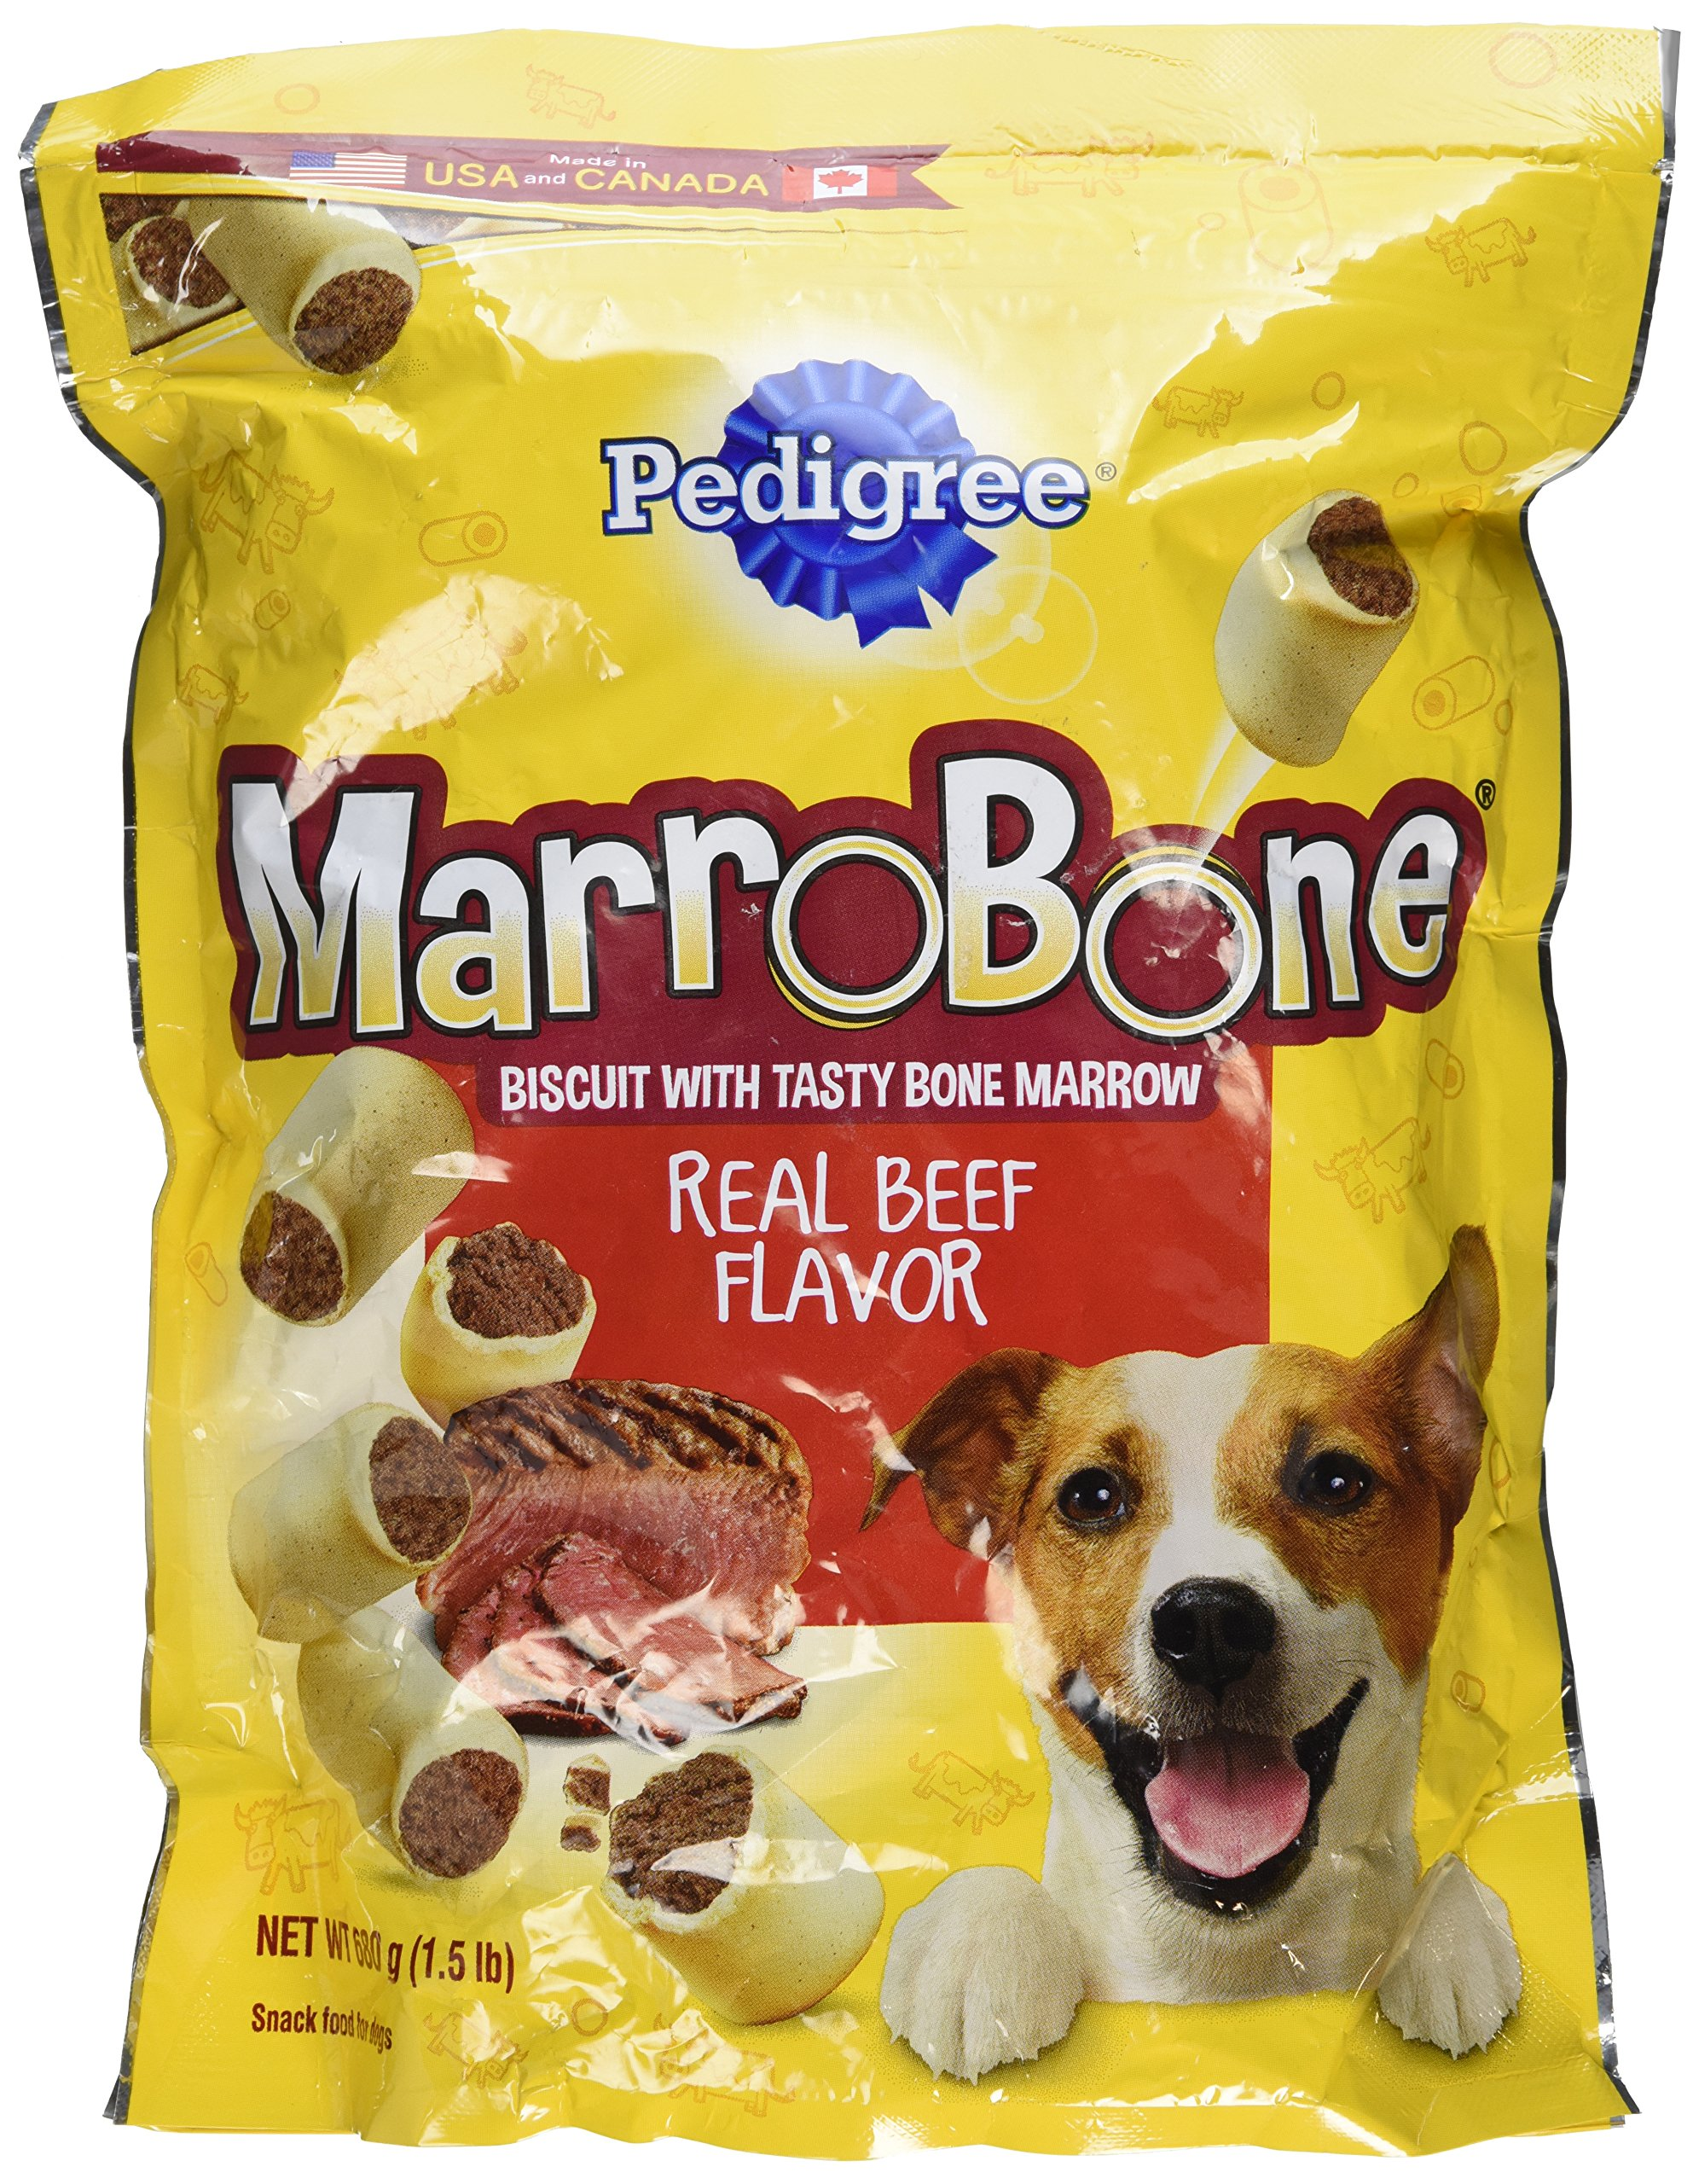 Milk-Bone Original Treats Dog Treats, 10 oz: Amazon.com